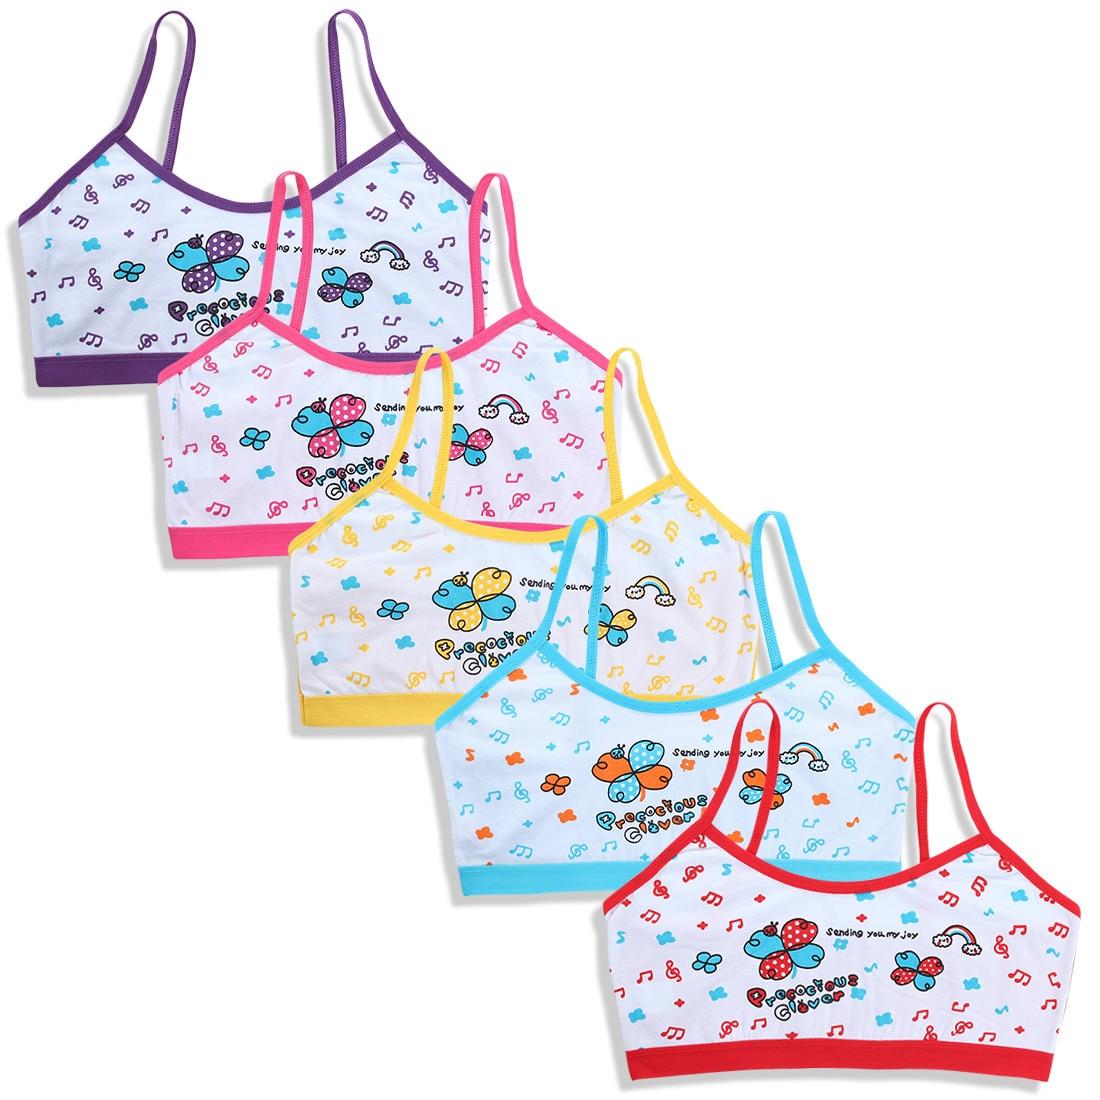 3Pc/lot Teenager Tank Top For Girls Cotton Kids Underwear Model Cartoon Kids Singlets Children Camisole Baby Bras Undershirt